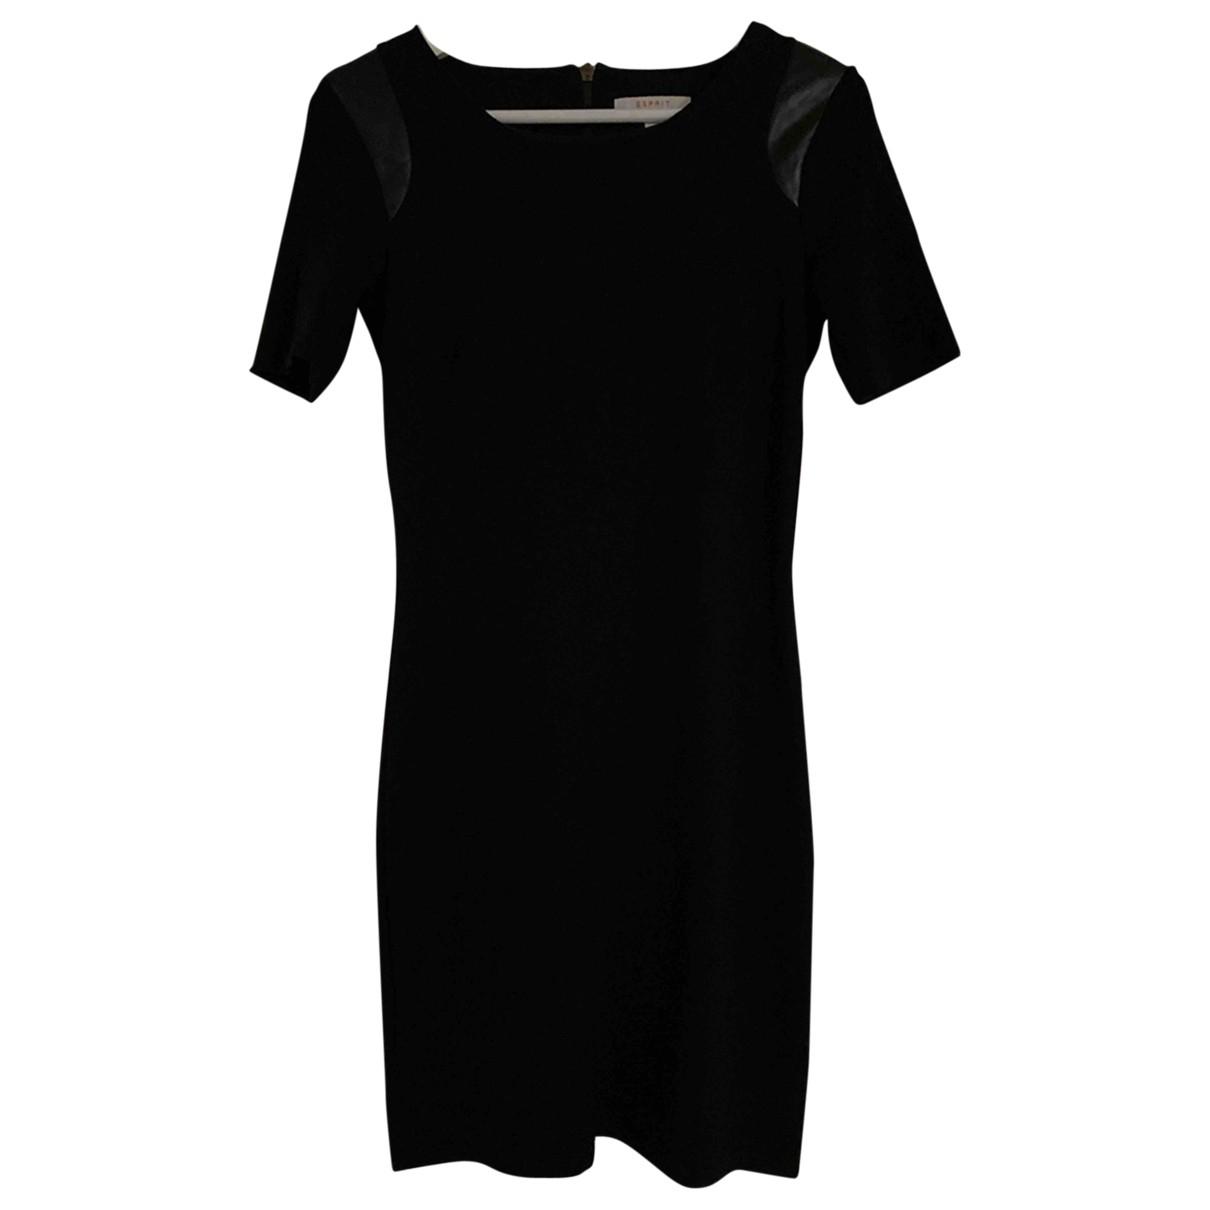 Esprit \N Kleid in  Schwarz Viskose